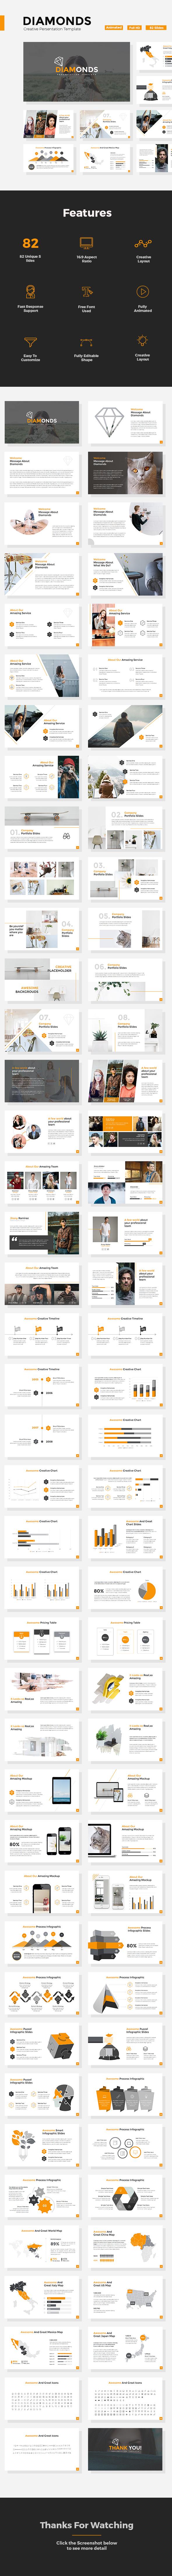 Diamonds - Creative Powerpoint Template - Creative PowerPoint Templates